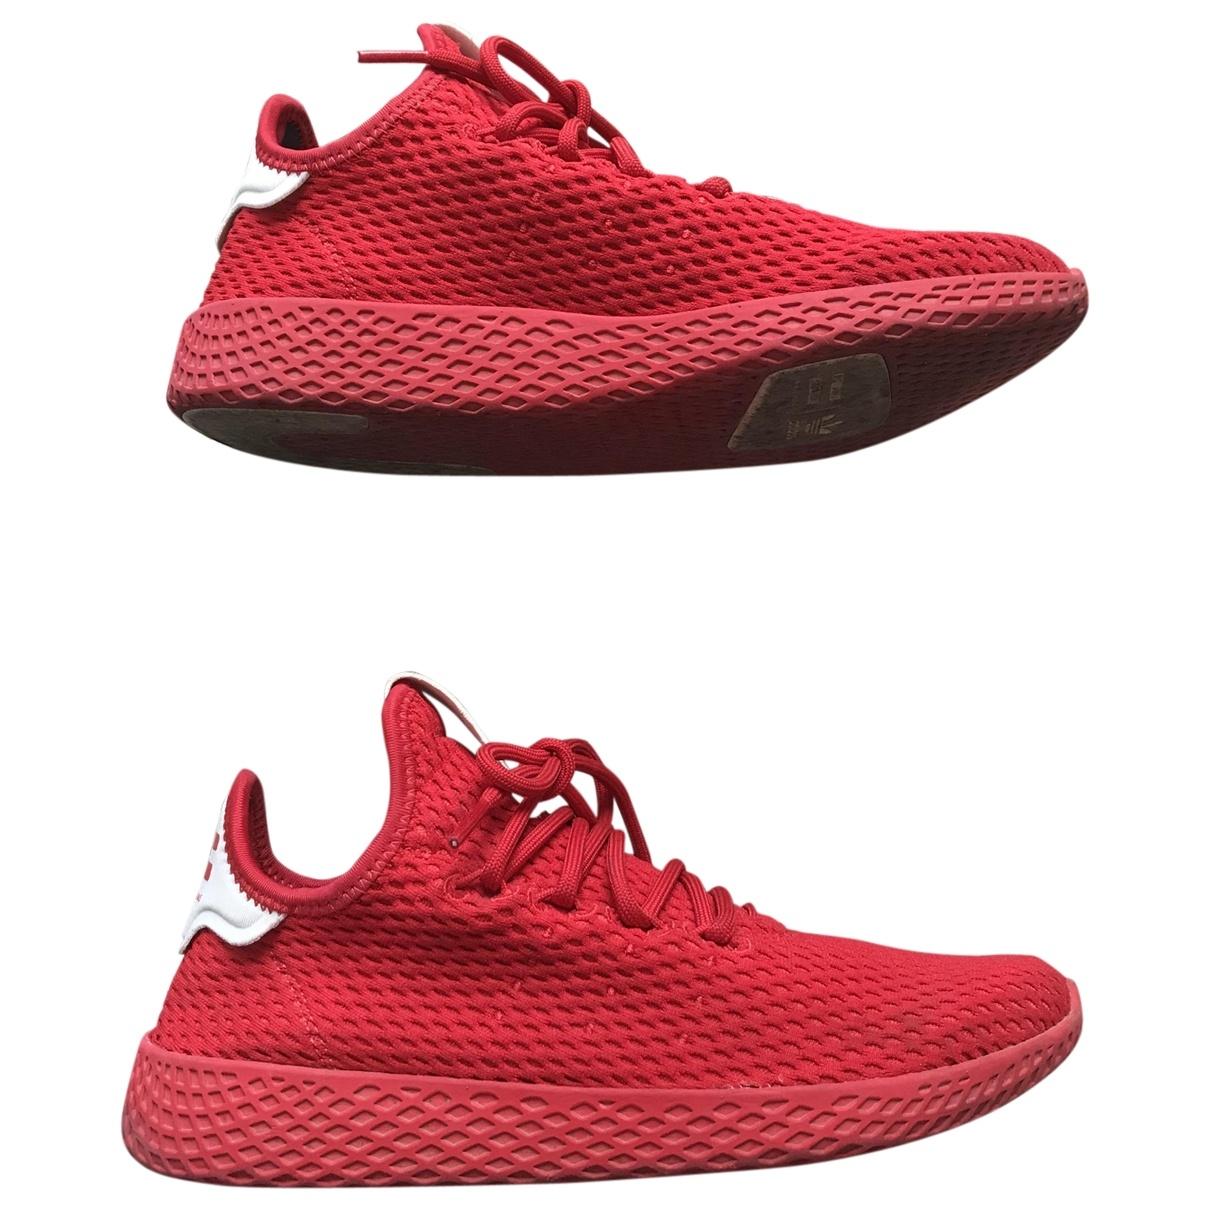 Adidas X Pharrell Williams \N Red Cloth Trainers for Women 37.5 EU